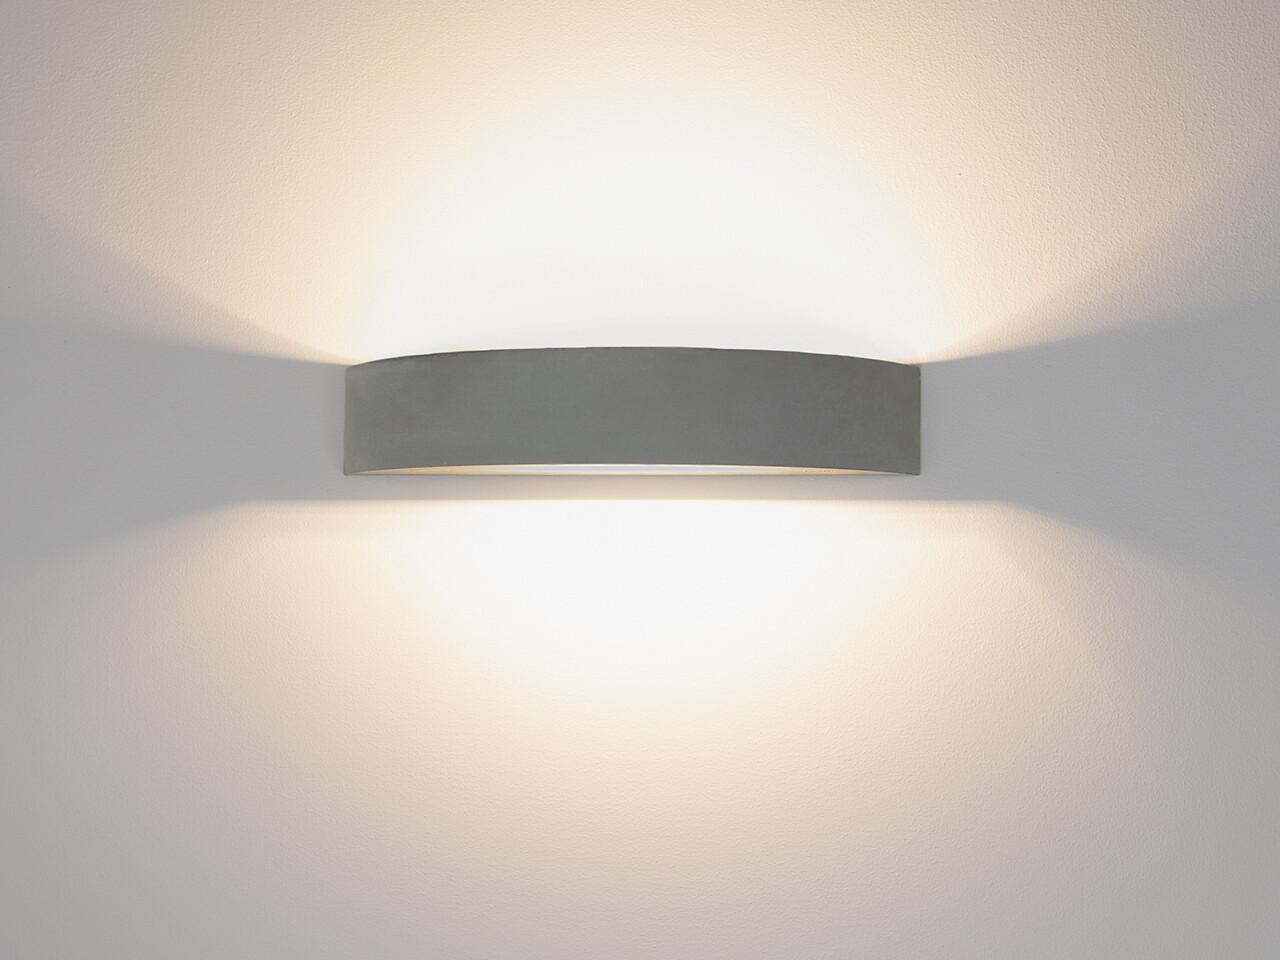 9010 Wandleuchte 1095B LED 10W, IP65, grau